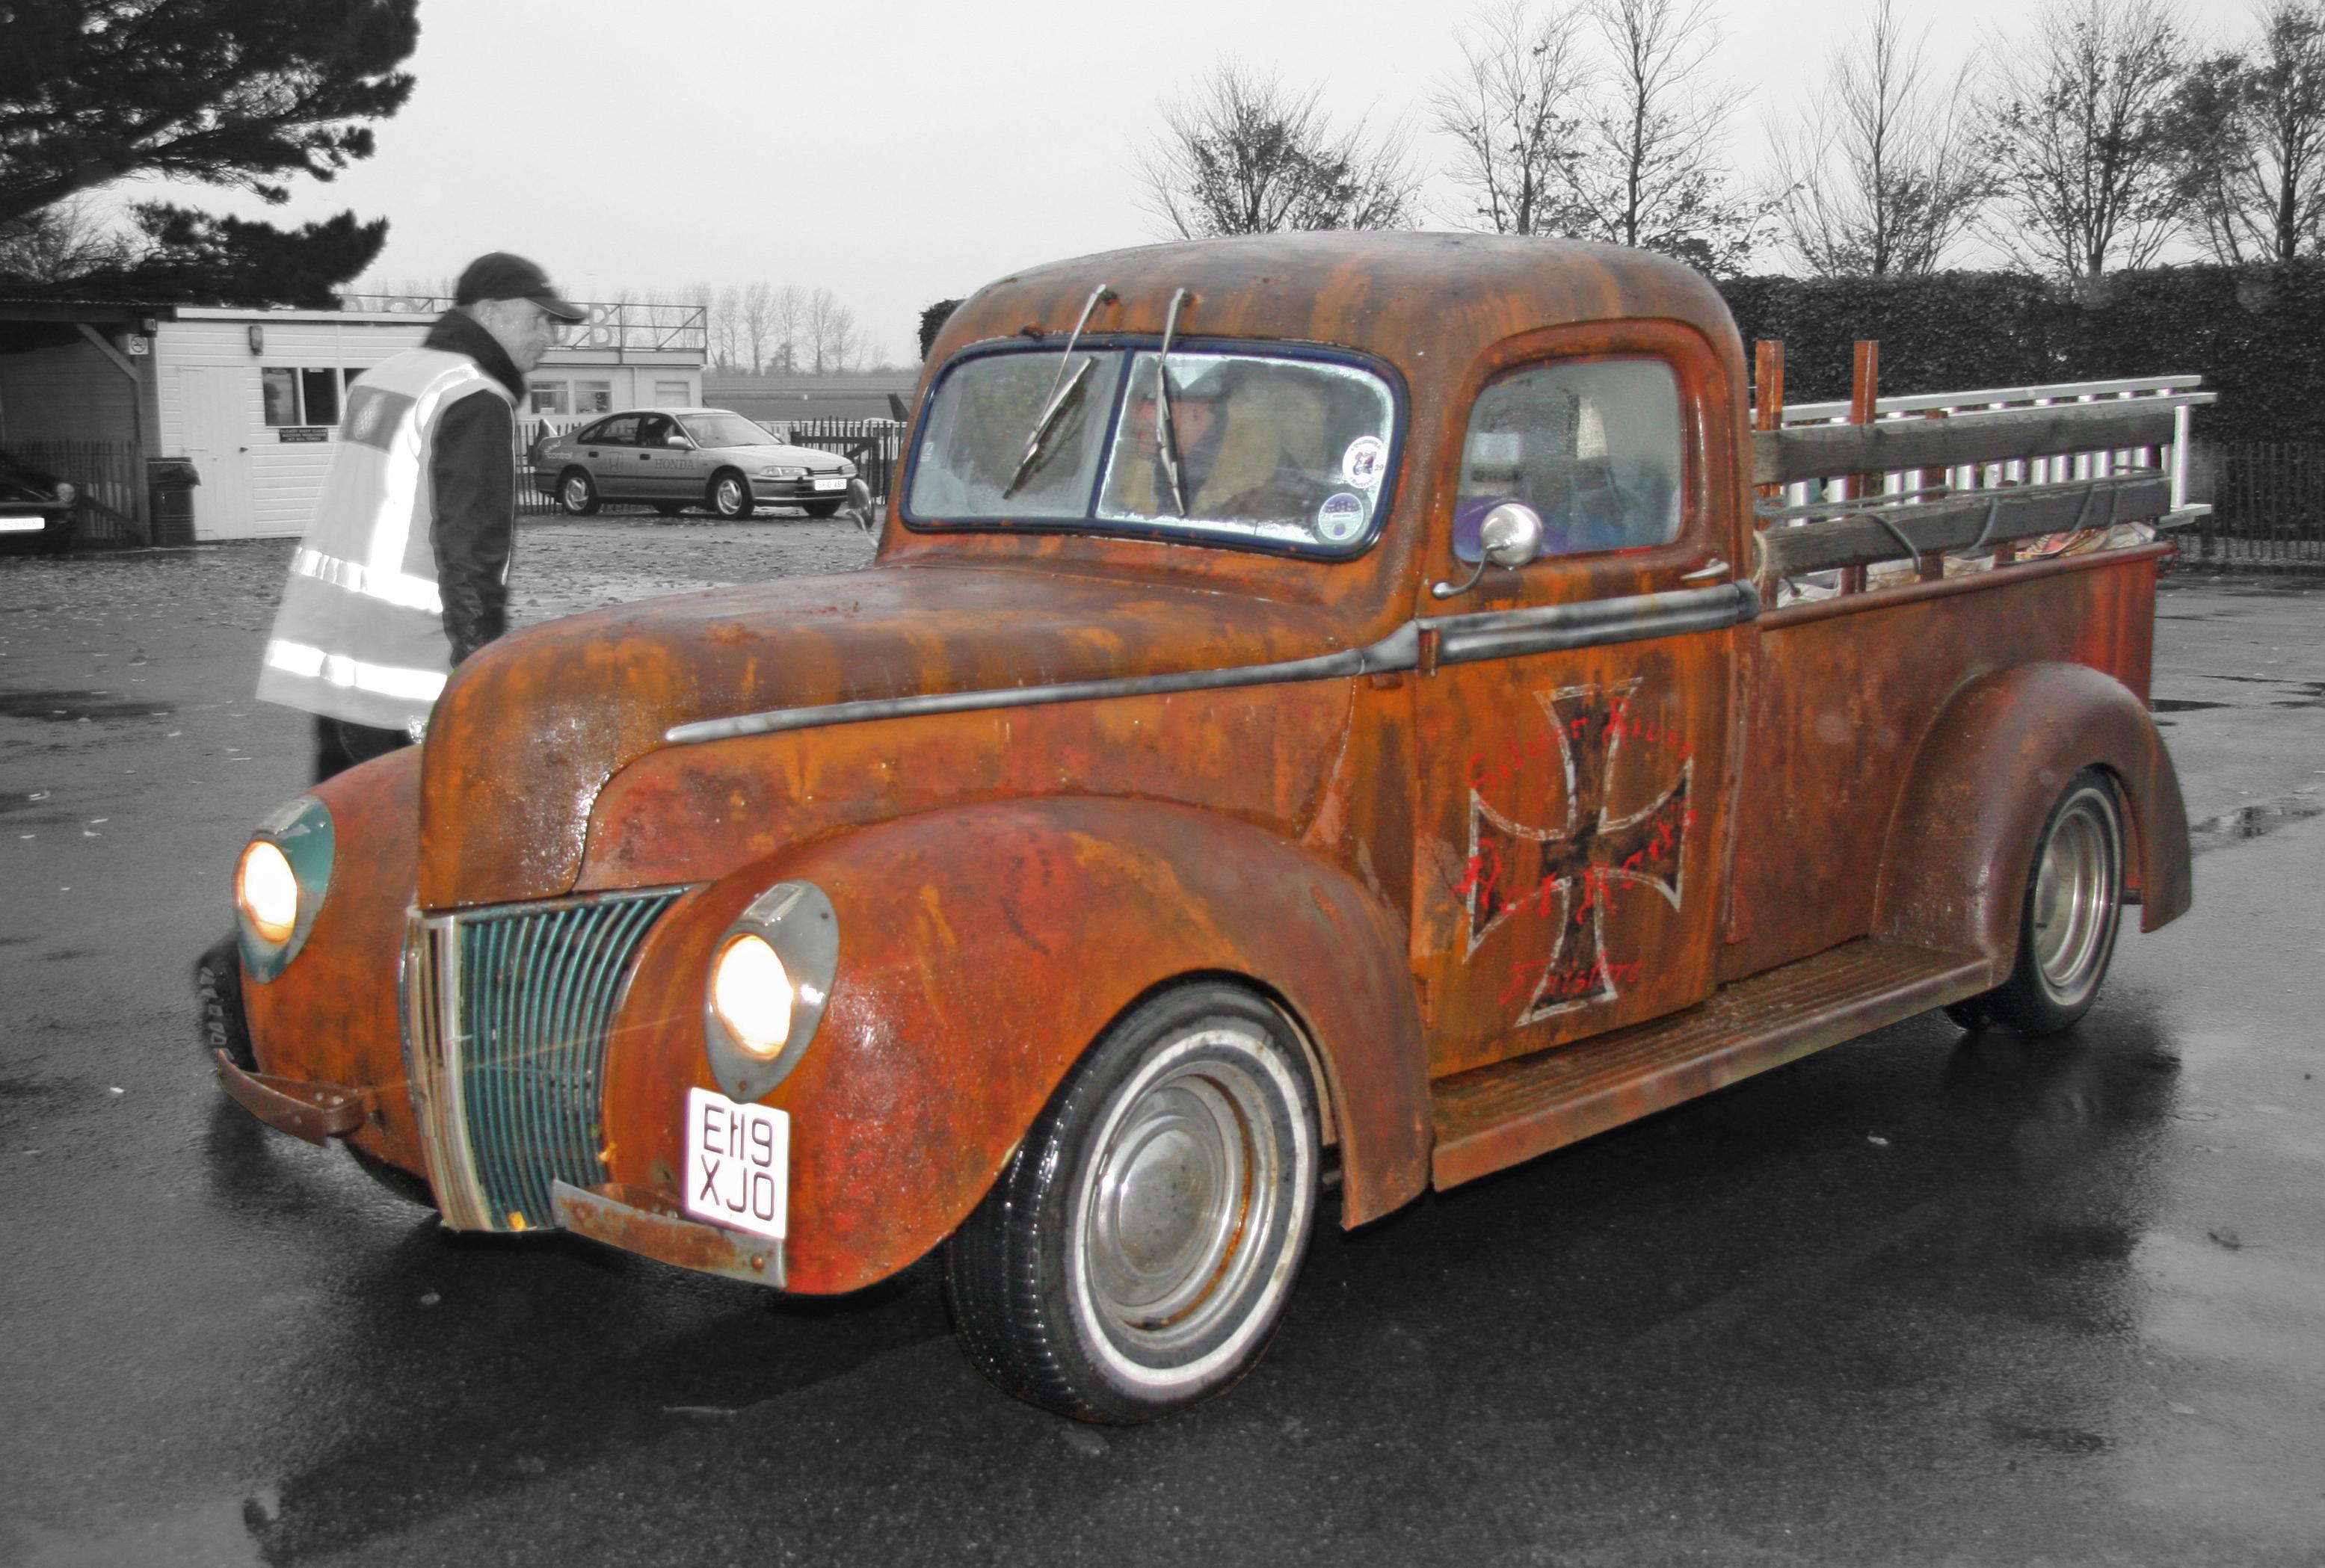 File:Ford Pickup Hot Rod 1940\'s - Flickr - exfordy.jpg - Wikimedia ...